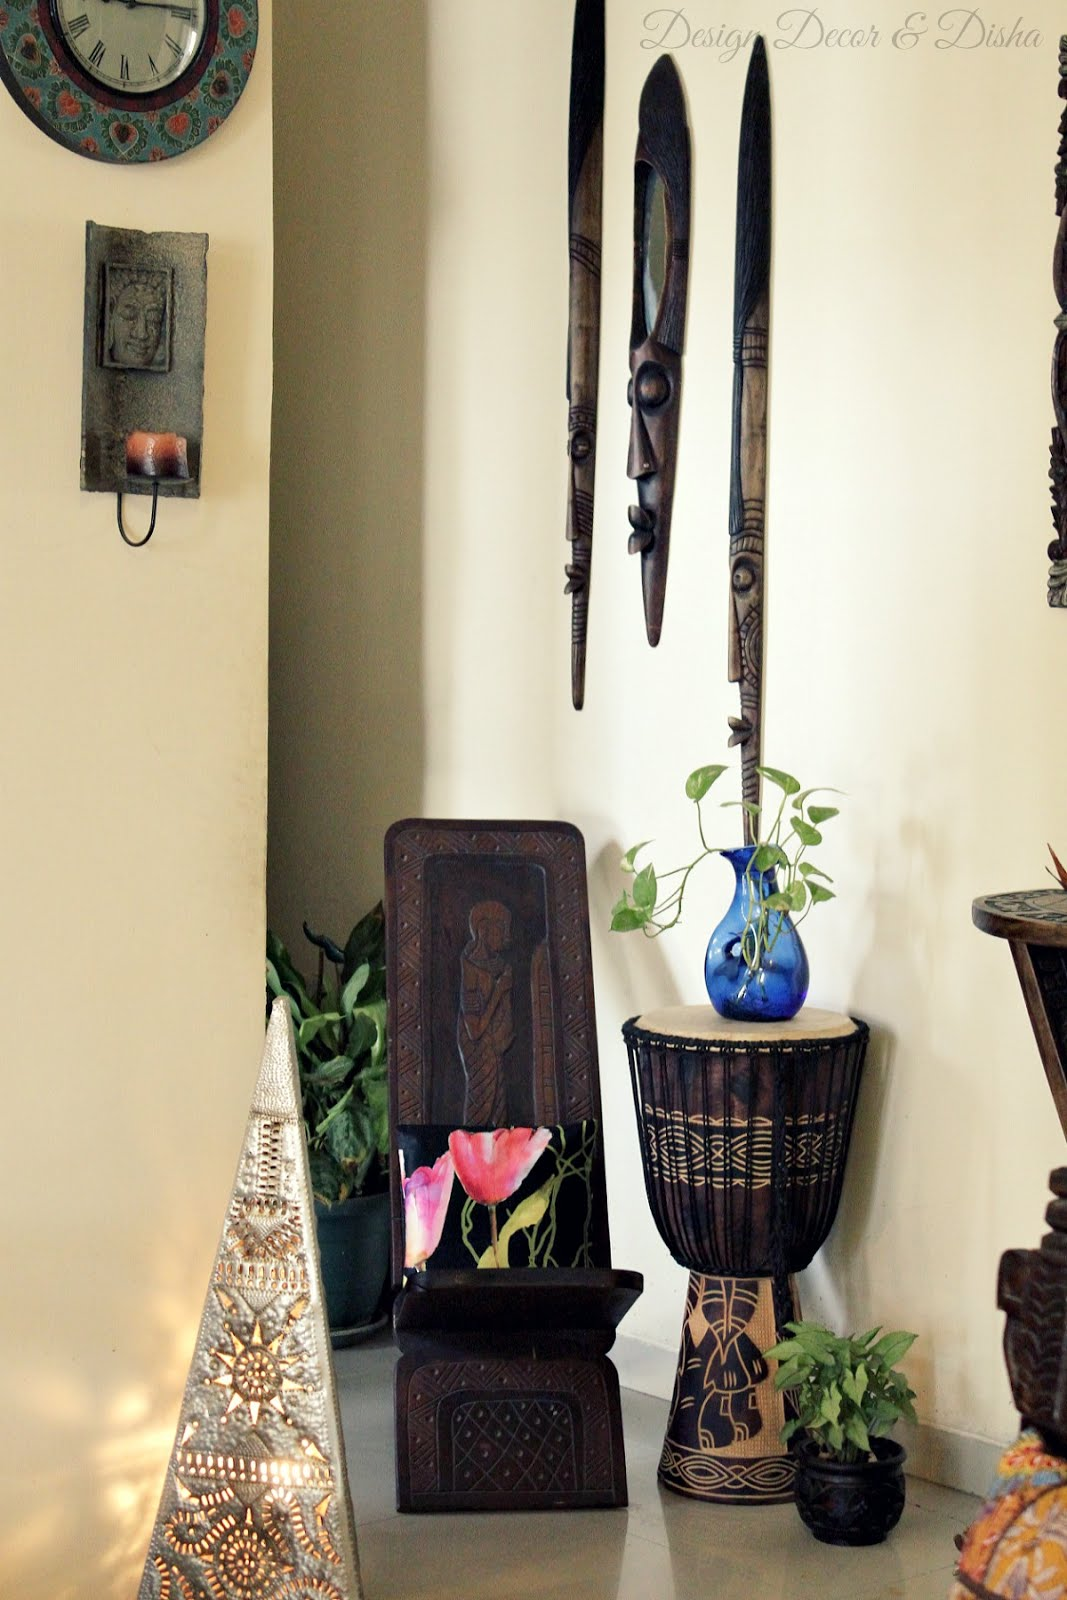 Design decor disha an indian design decor blog home for Indian style decorating ideas